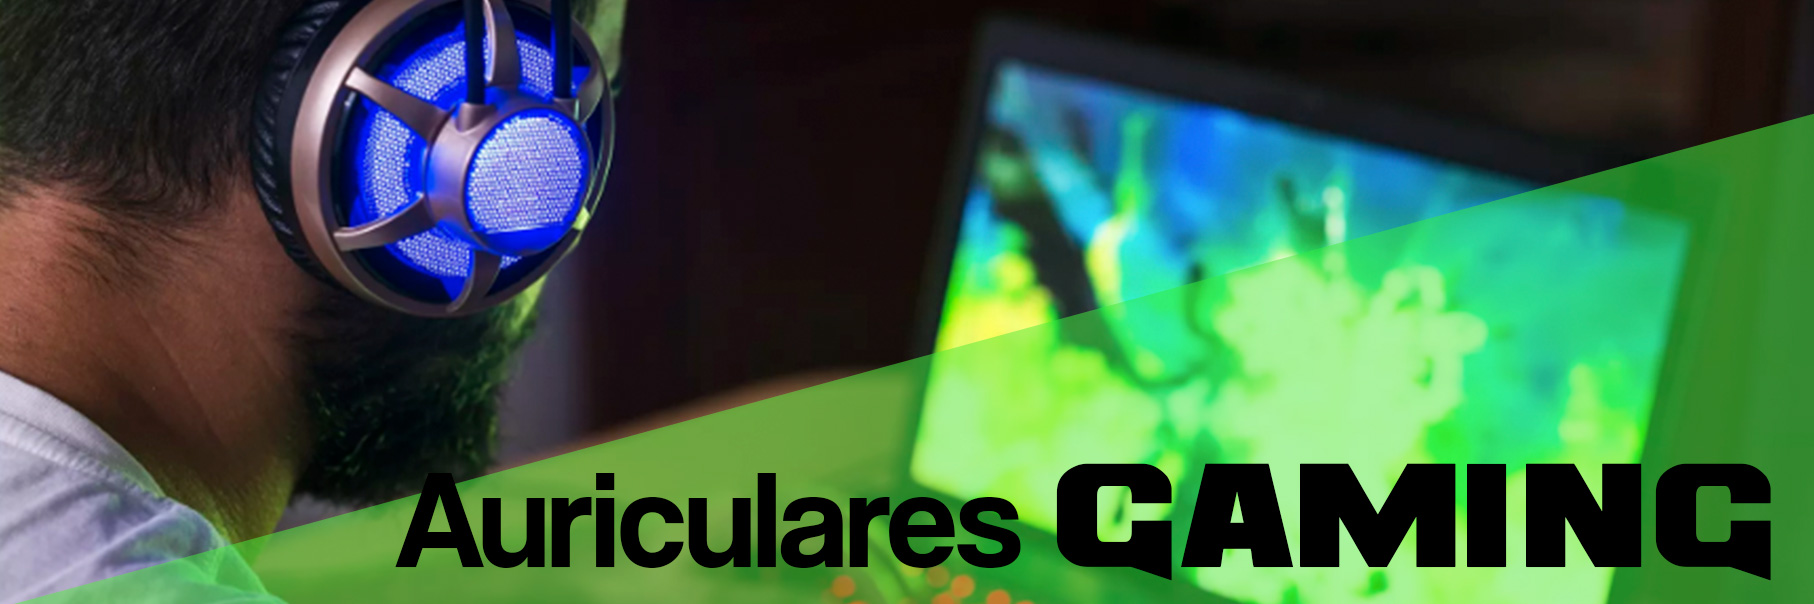 Imagen destacada blog megasur auriculares